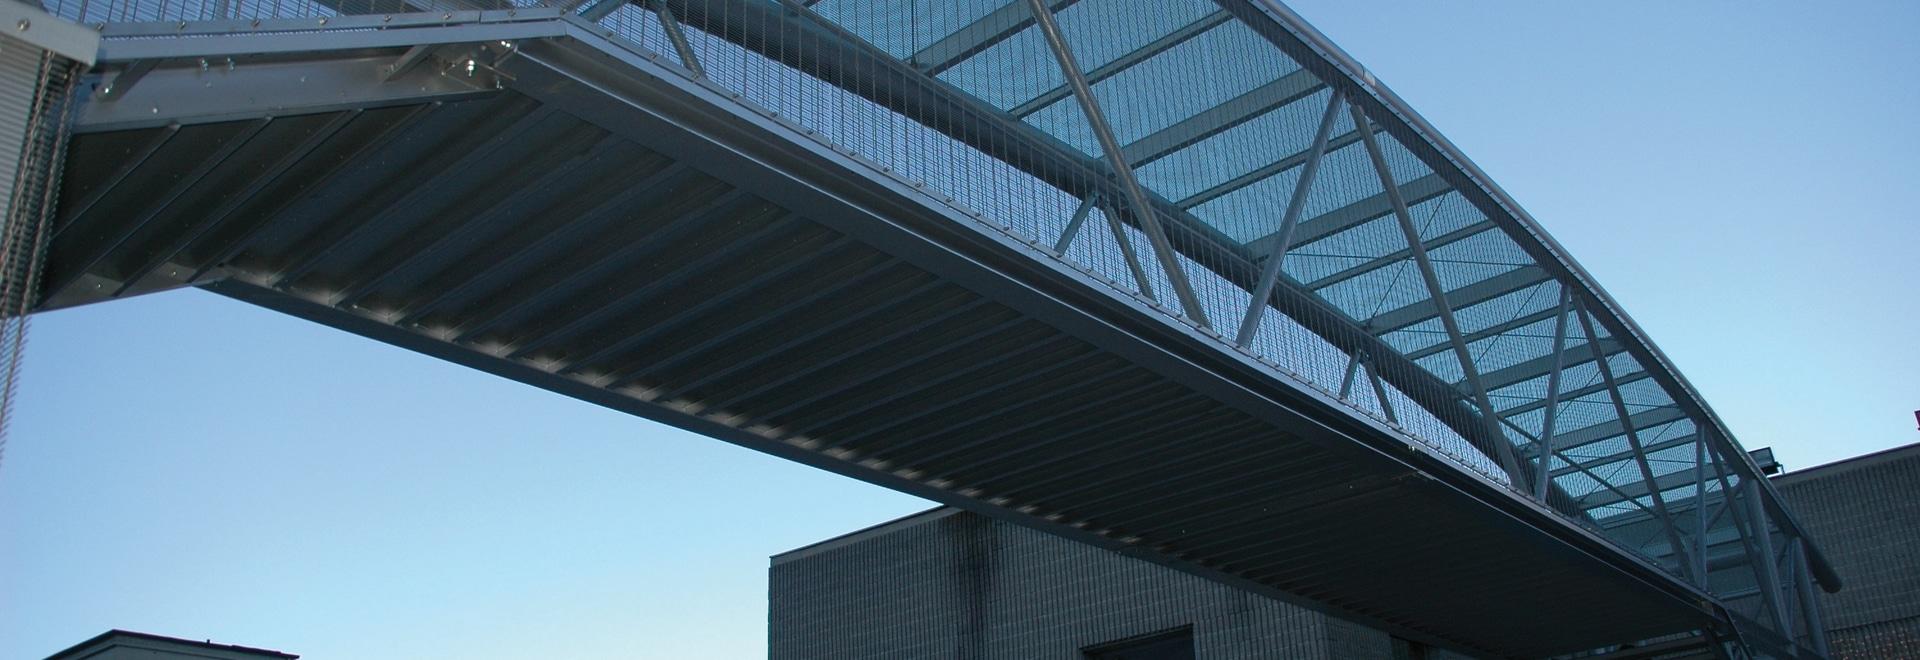 pedestrian Bridge Carcano